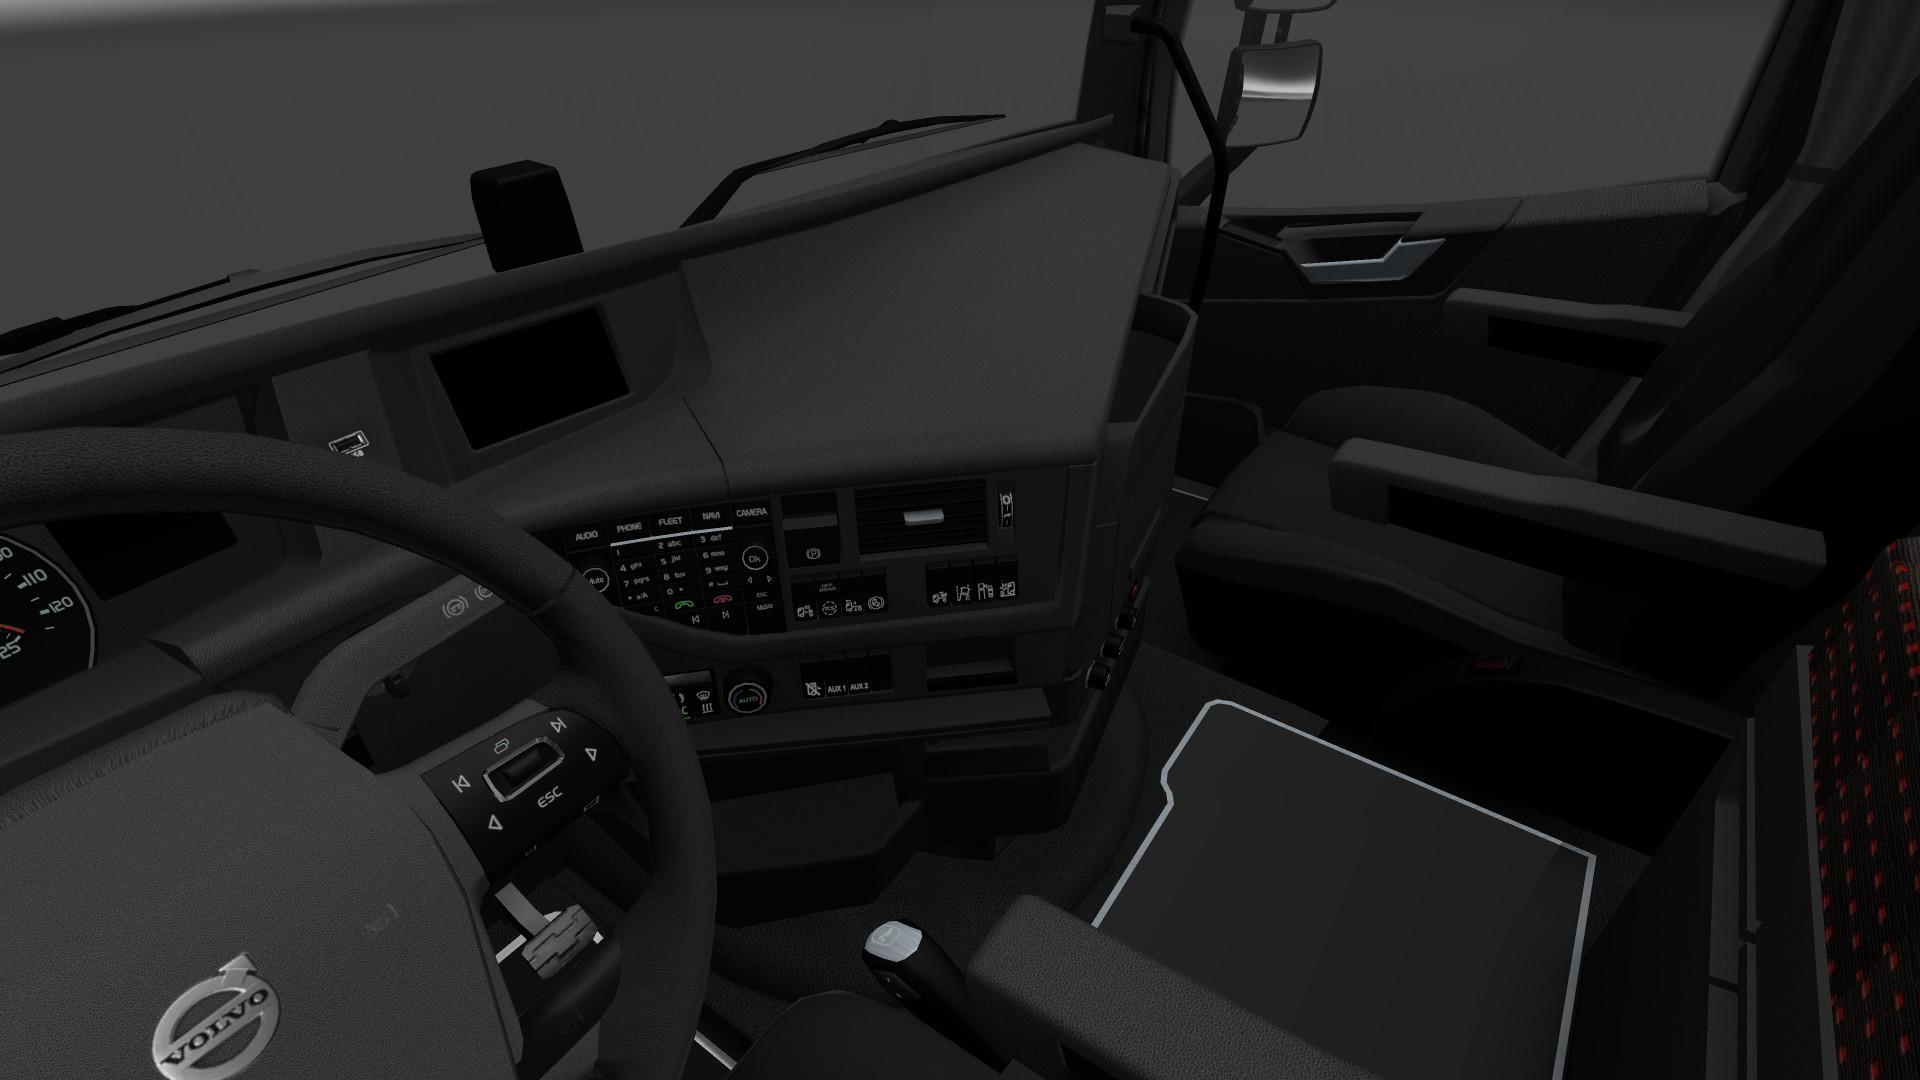 VOLVO FH16 2012 DARK INTERIOR V1 Mod -Euro Truck Simulator 2 Mods